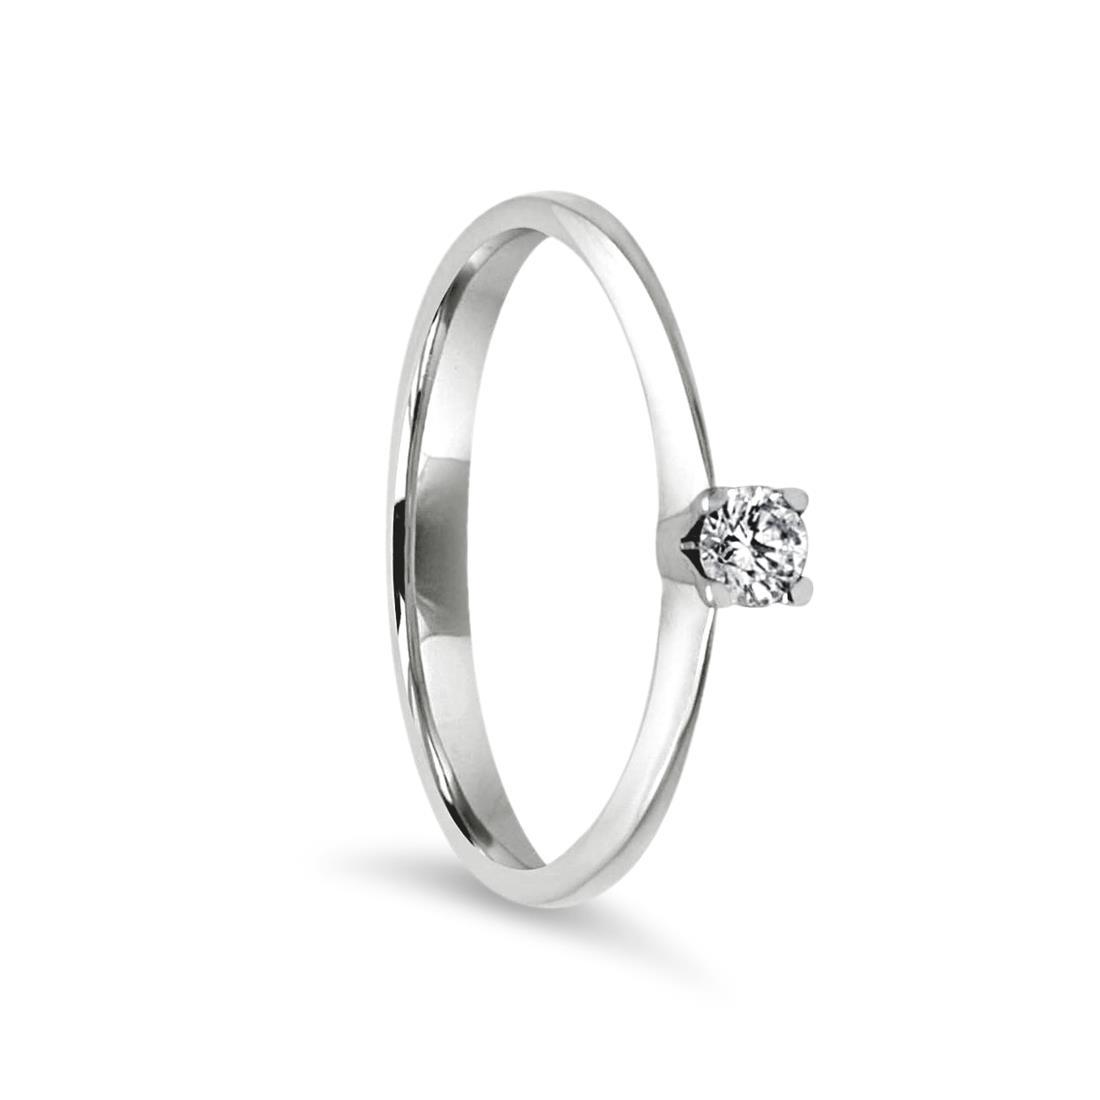 Ring with diamond - ALFIERI & ST. JOHN